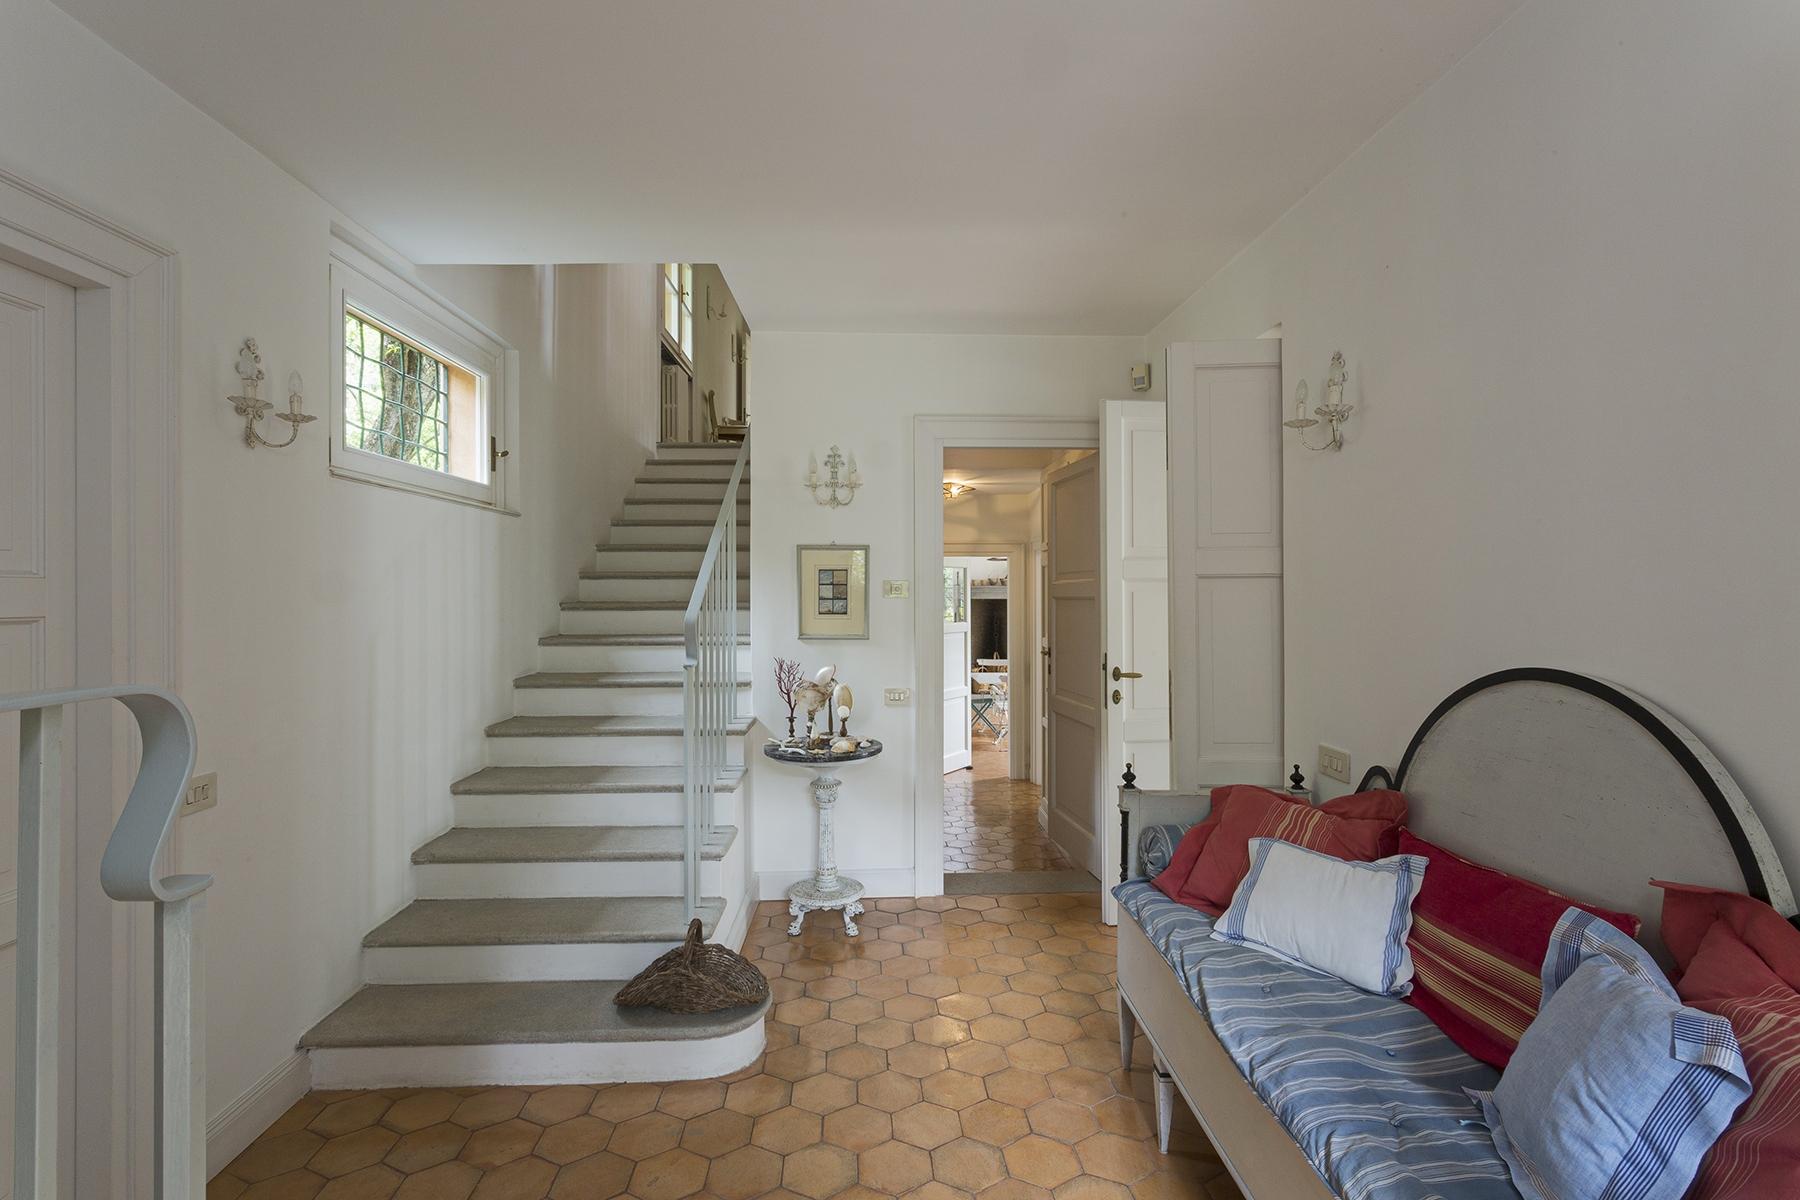 Villa in Vendita a Santa Margherita Ligure: 5 locali, 580 mq - Foto 17